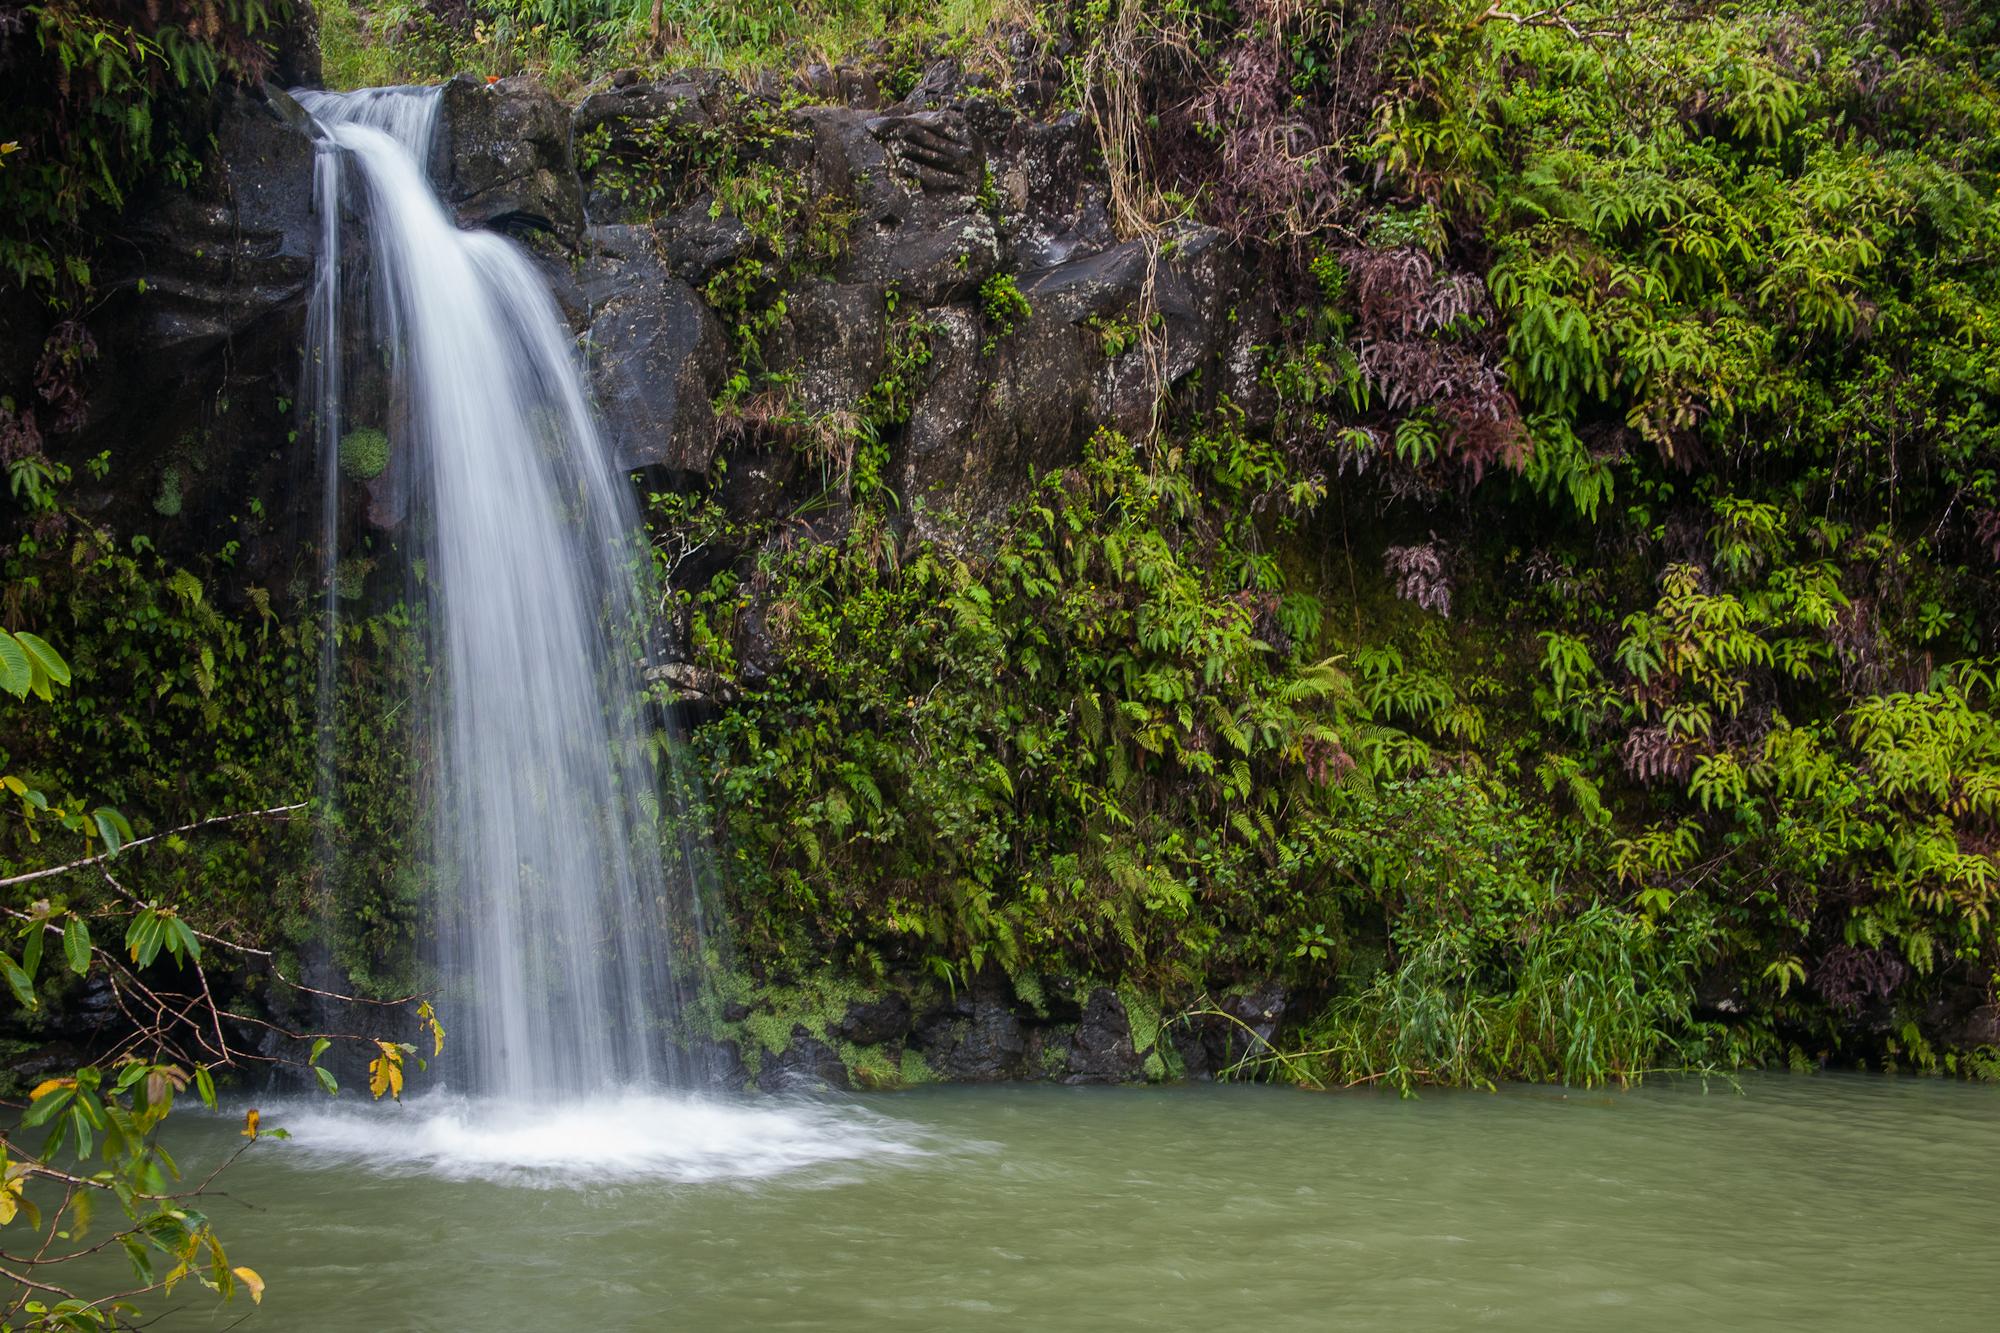 File Small Waterfall On The Road To Hana 8017236735 Jpg Wikimedia Commons